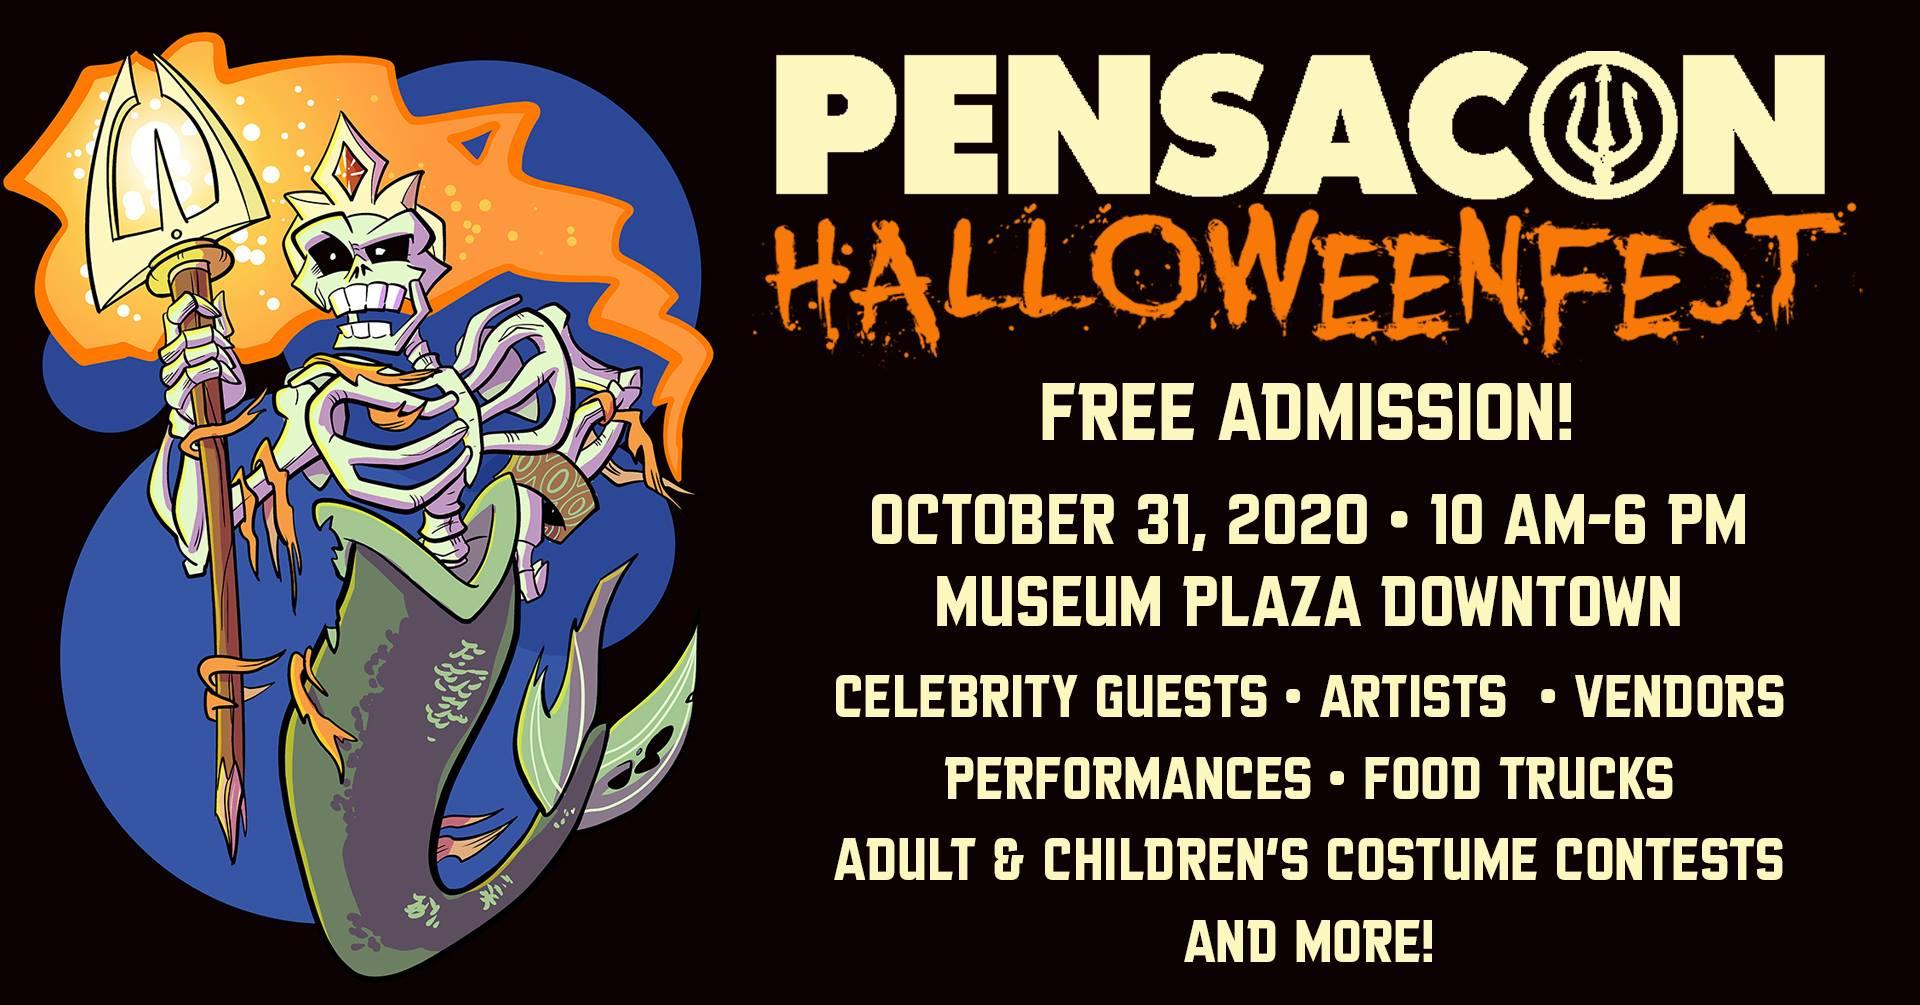 Halloween Pensacola 2020 Pensacon HalloweenFest event set for downtown Pensacola Oct. 31, 2020